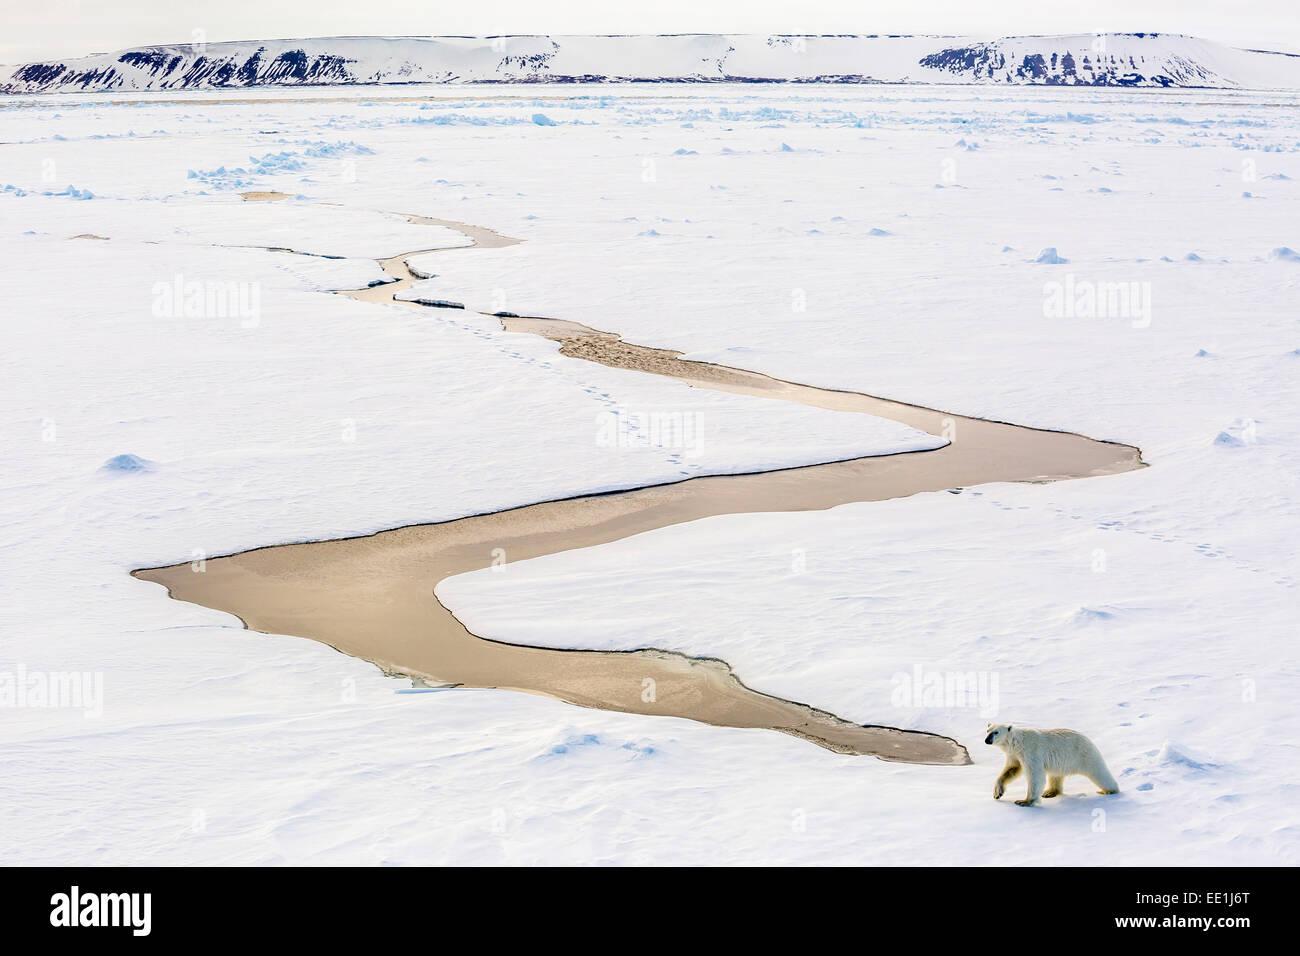 Adult polar bear (Ursus maritimus) on first year sea ice in Olga Strait, near Edgeoya, Svalbard, Arctic, Norway, - Stock Image